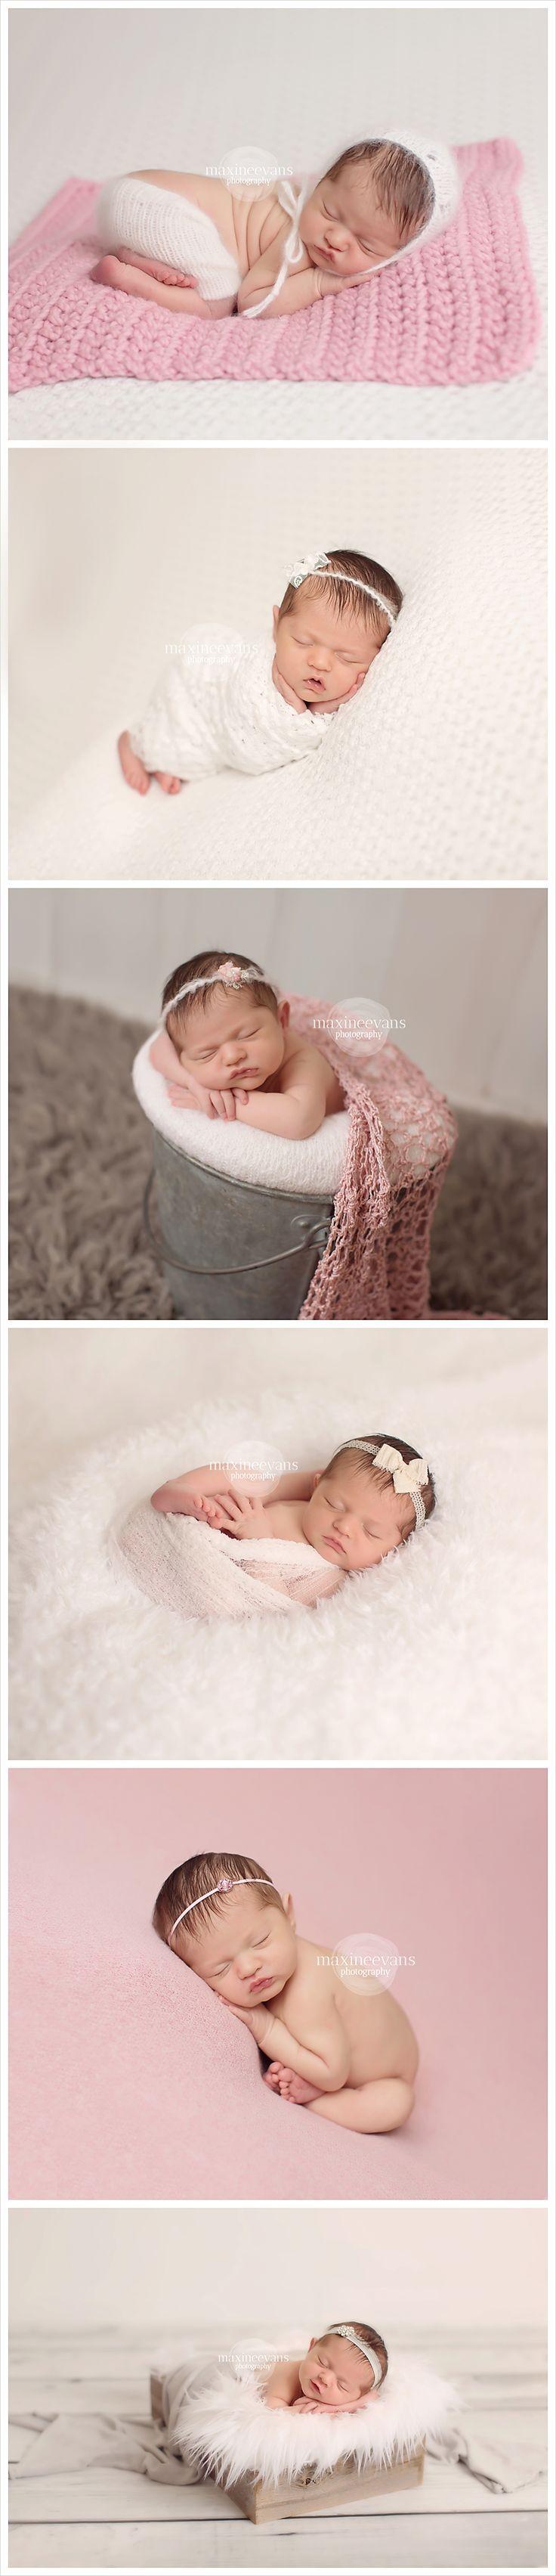 Los Angeles Newborn Baby Photography - Maxine Evans Photography www.maxineevansphotography.com Los Angeles   Thousand Oaks   Woodland Hills   West LA   Agoura Hills #losangelesnewbornbaby #losangelesnewborn #losangelesnewbornphotographer